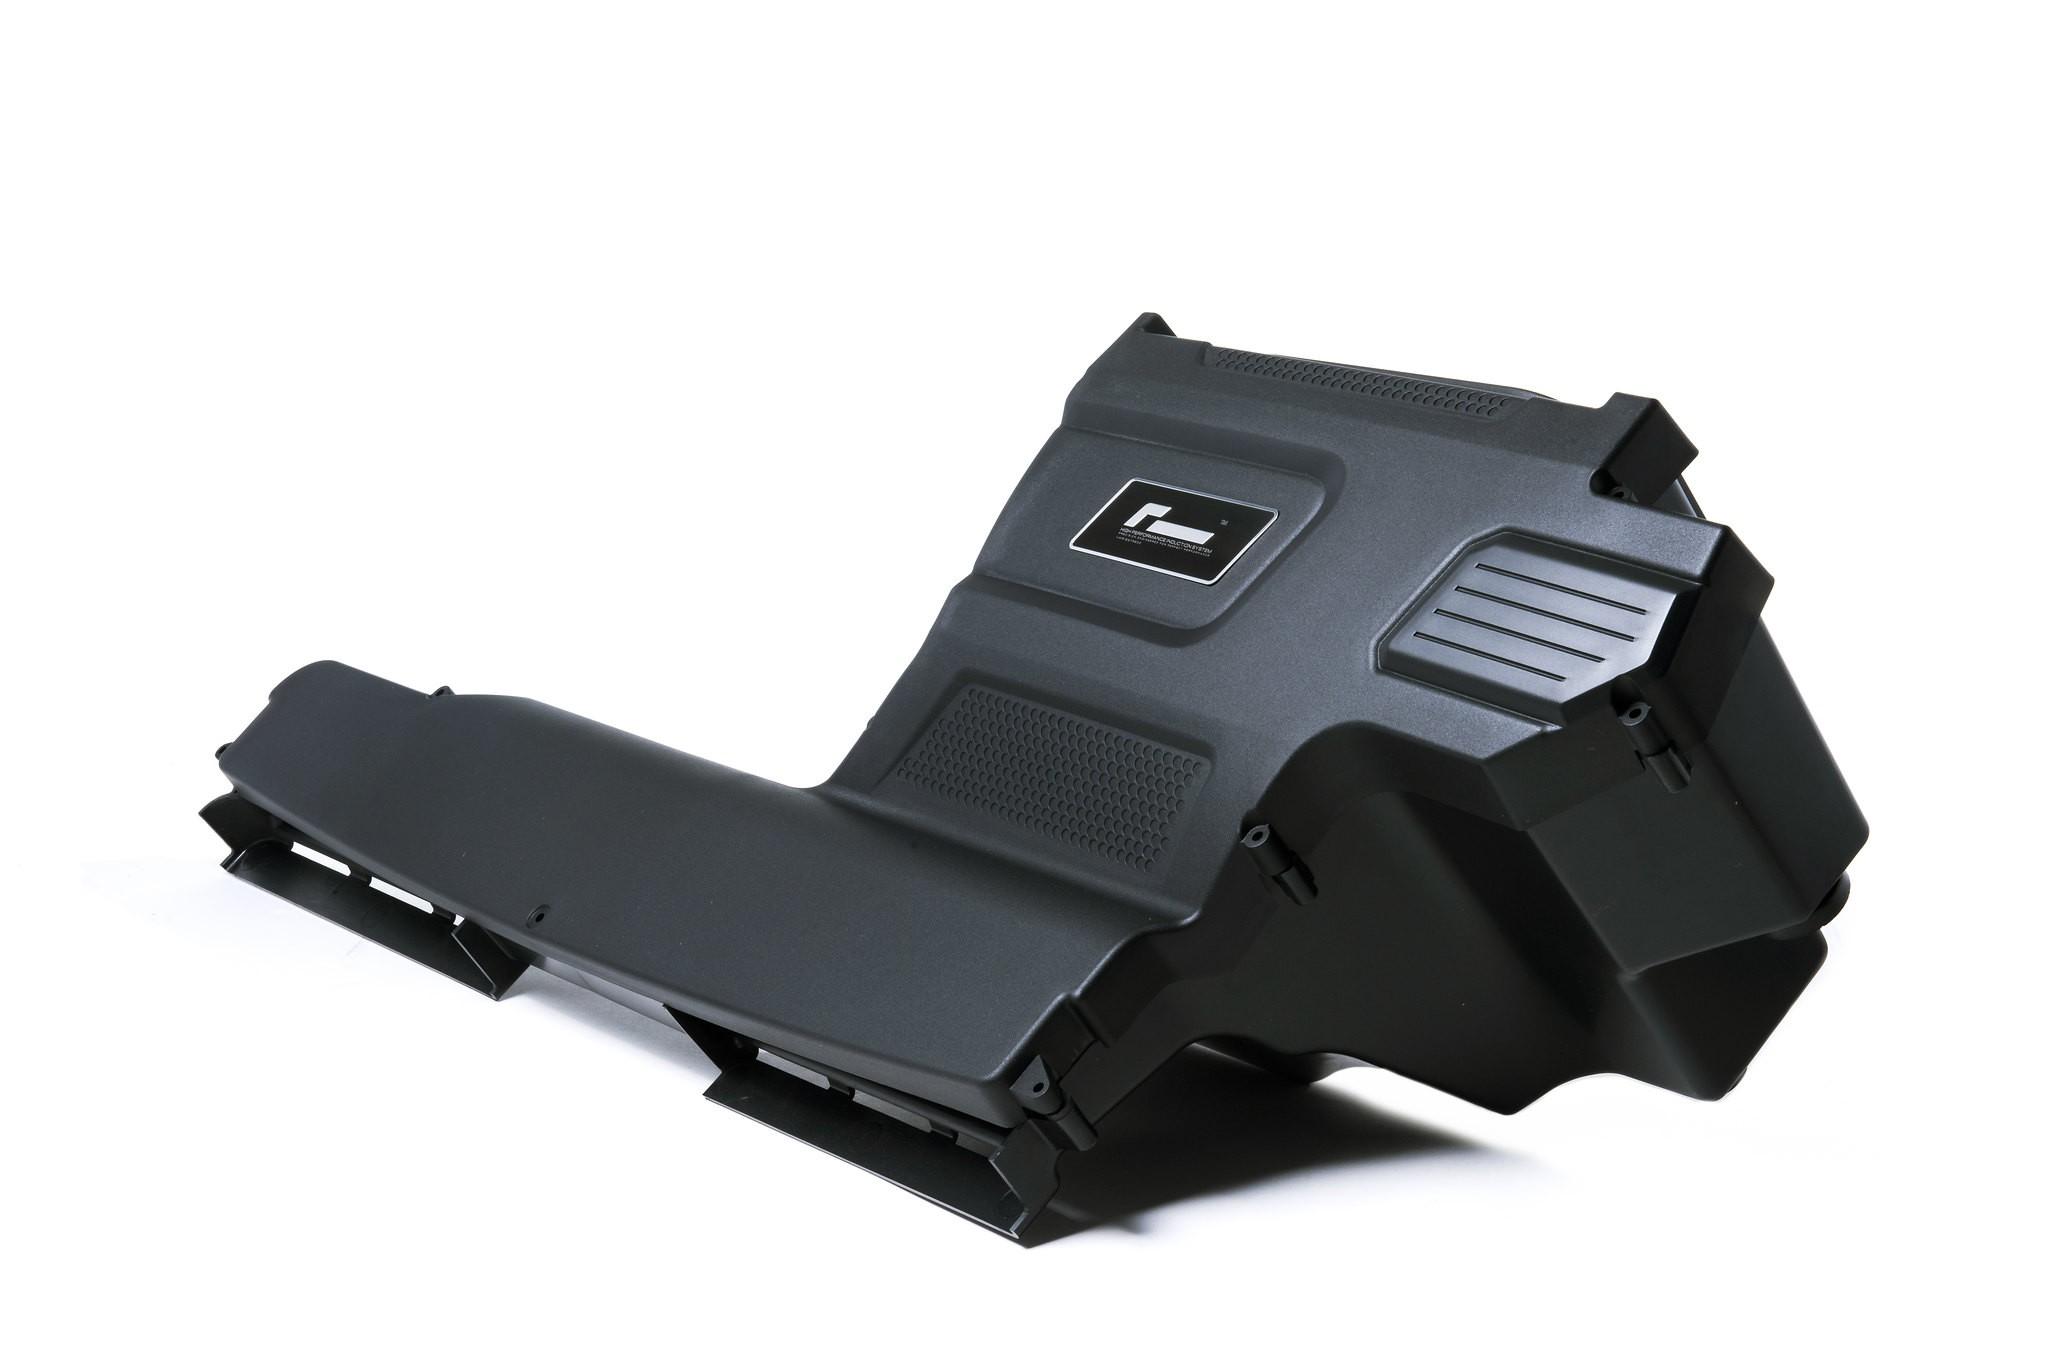 RacingLine R600 Air Intake System, Audi/Volkswagen 1.8T/2.0T Gen 3 (MQB) - Cotton Filter   VWR12G7R601USA